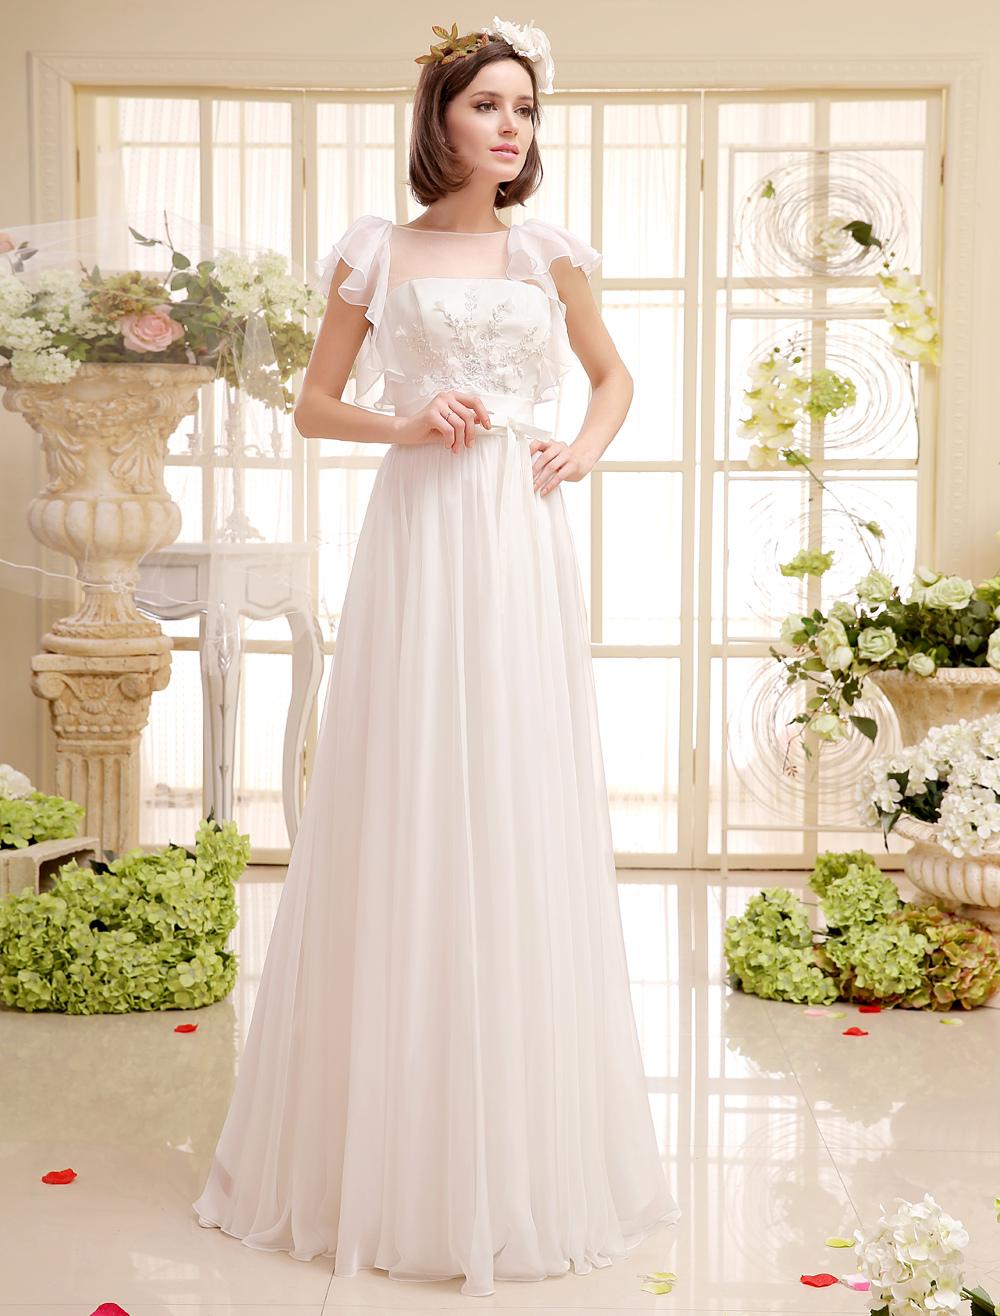 Buy Floor-Length Wedding Dress For Bride With Beading Jewel Neck Chiffon Milanoo for $149.99 in Milanoo store